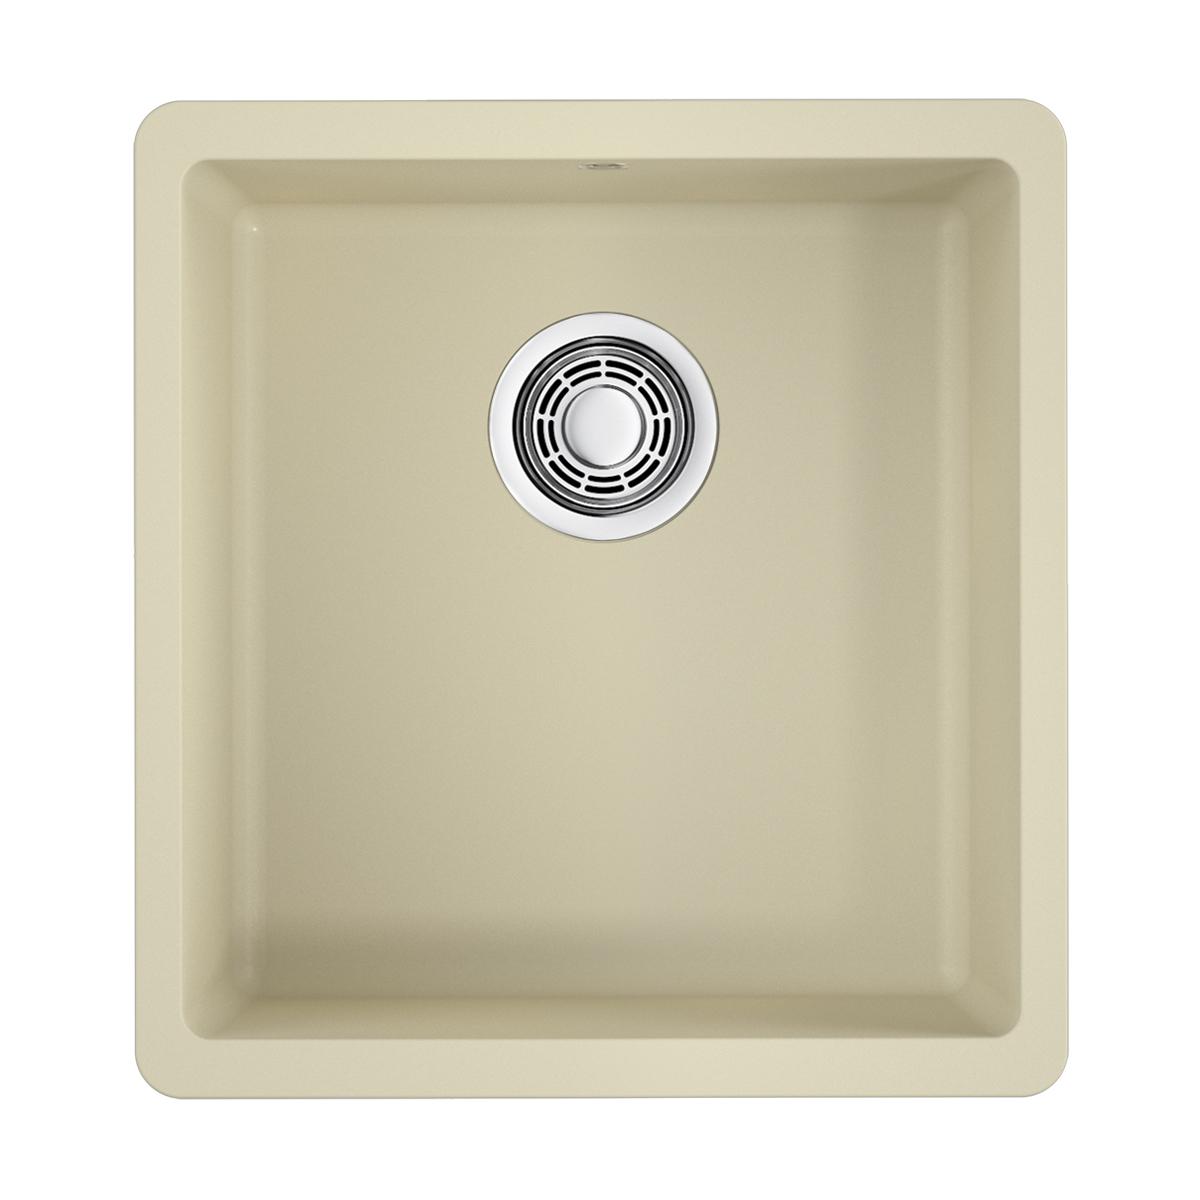 Omoikiri Kata 40-U-BE Artgranit/ваниль